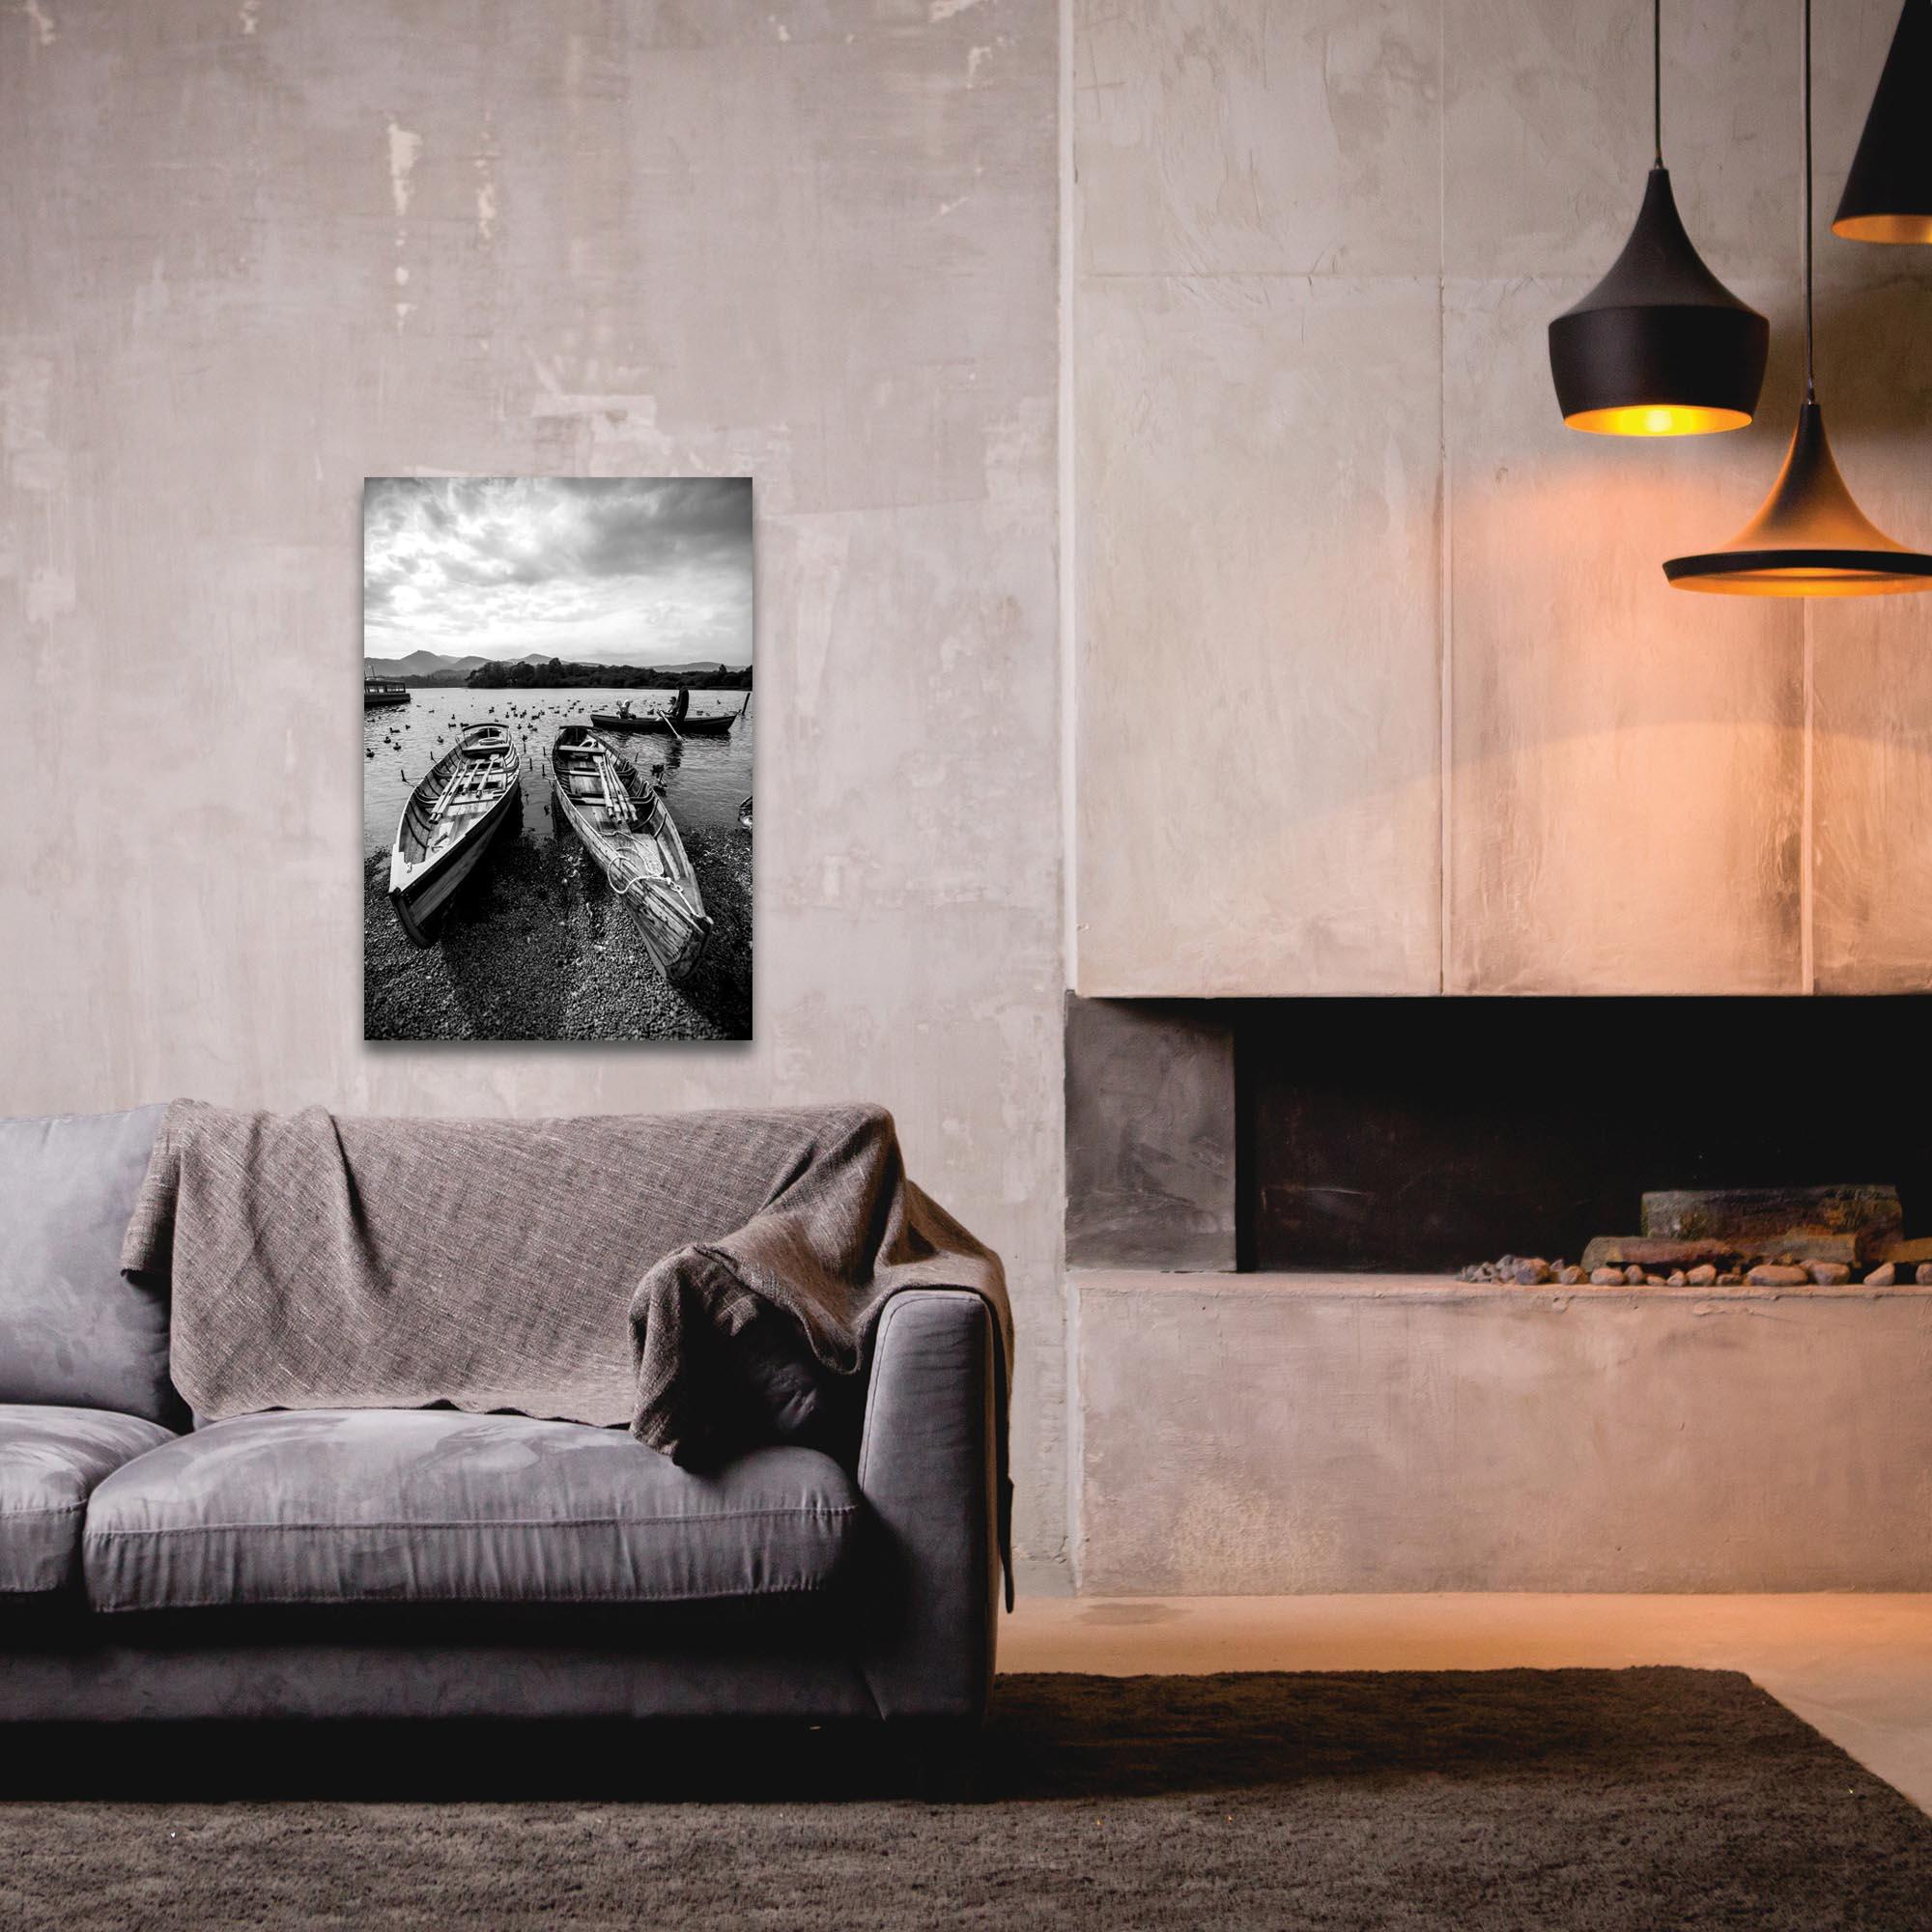 Black & White Photography 'Old Rowboats' - Coastal Art on Metal or Plexiglass - Lifestyle View